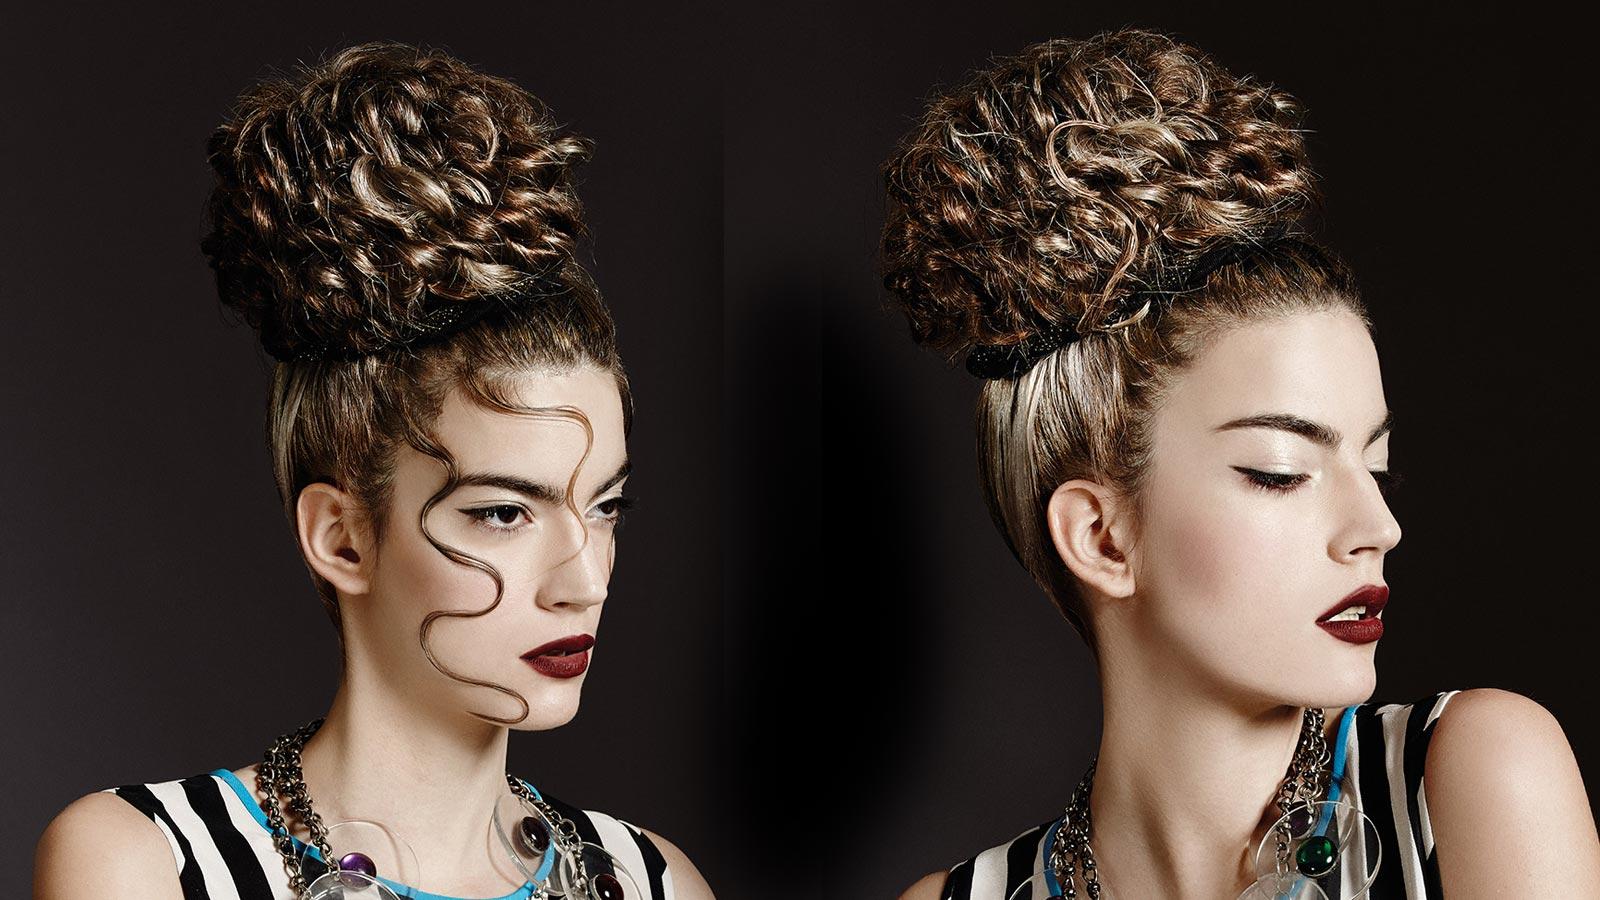 Glamour léto 2015 podle Framesi.